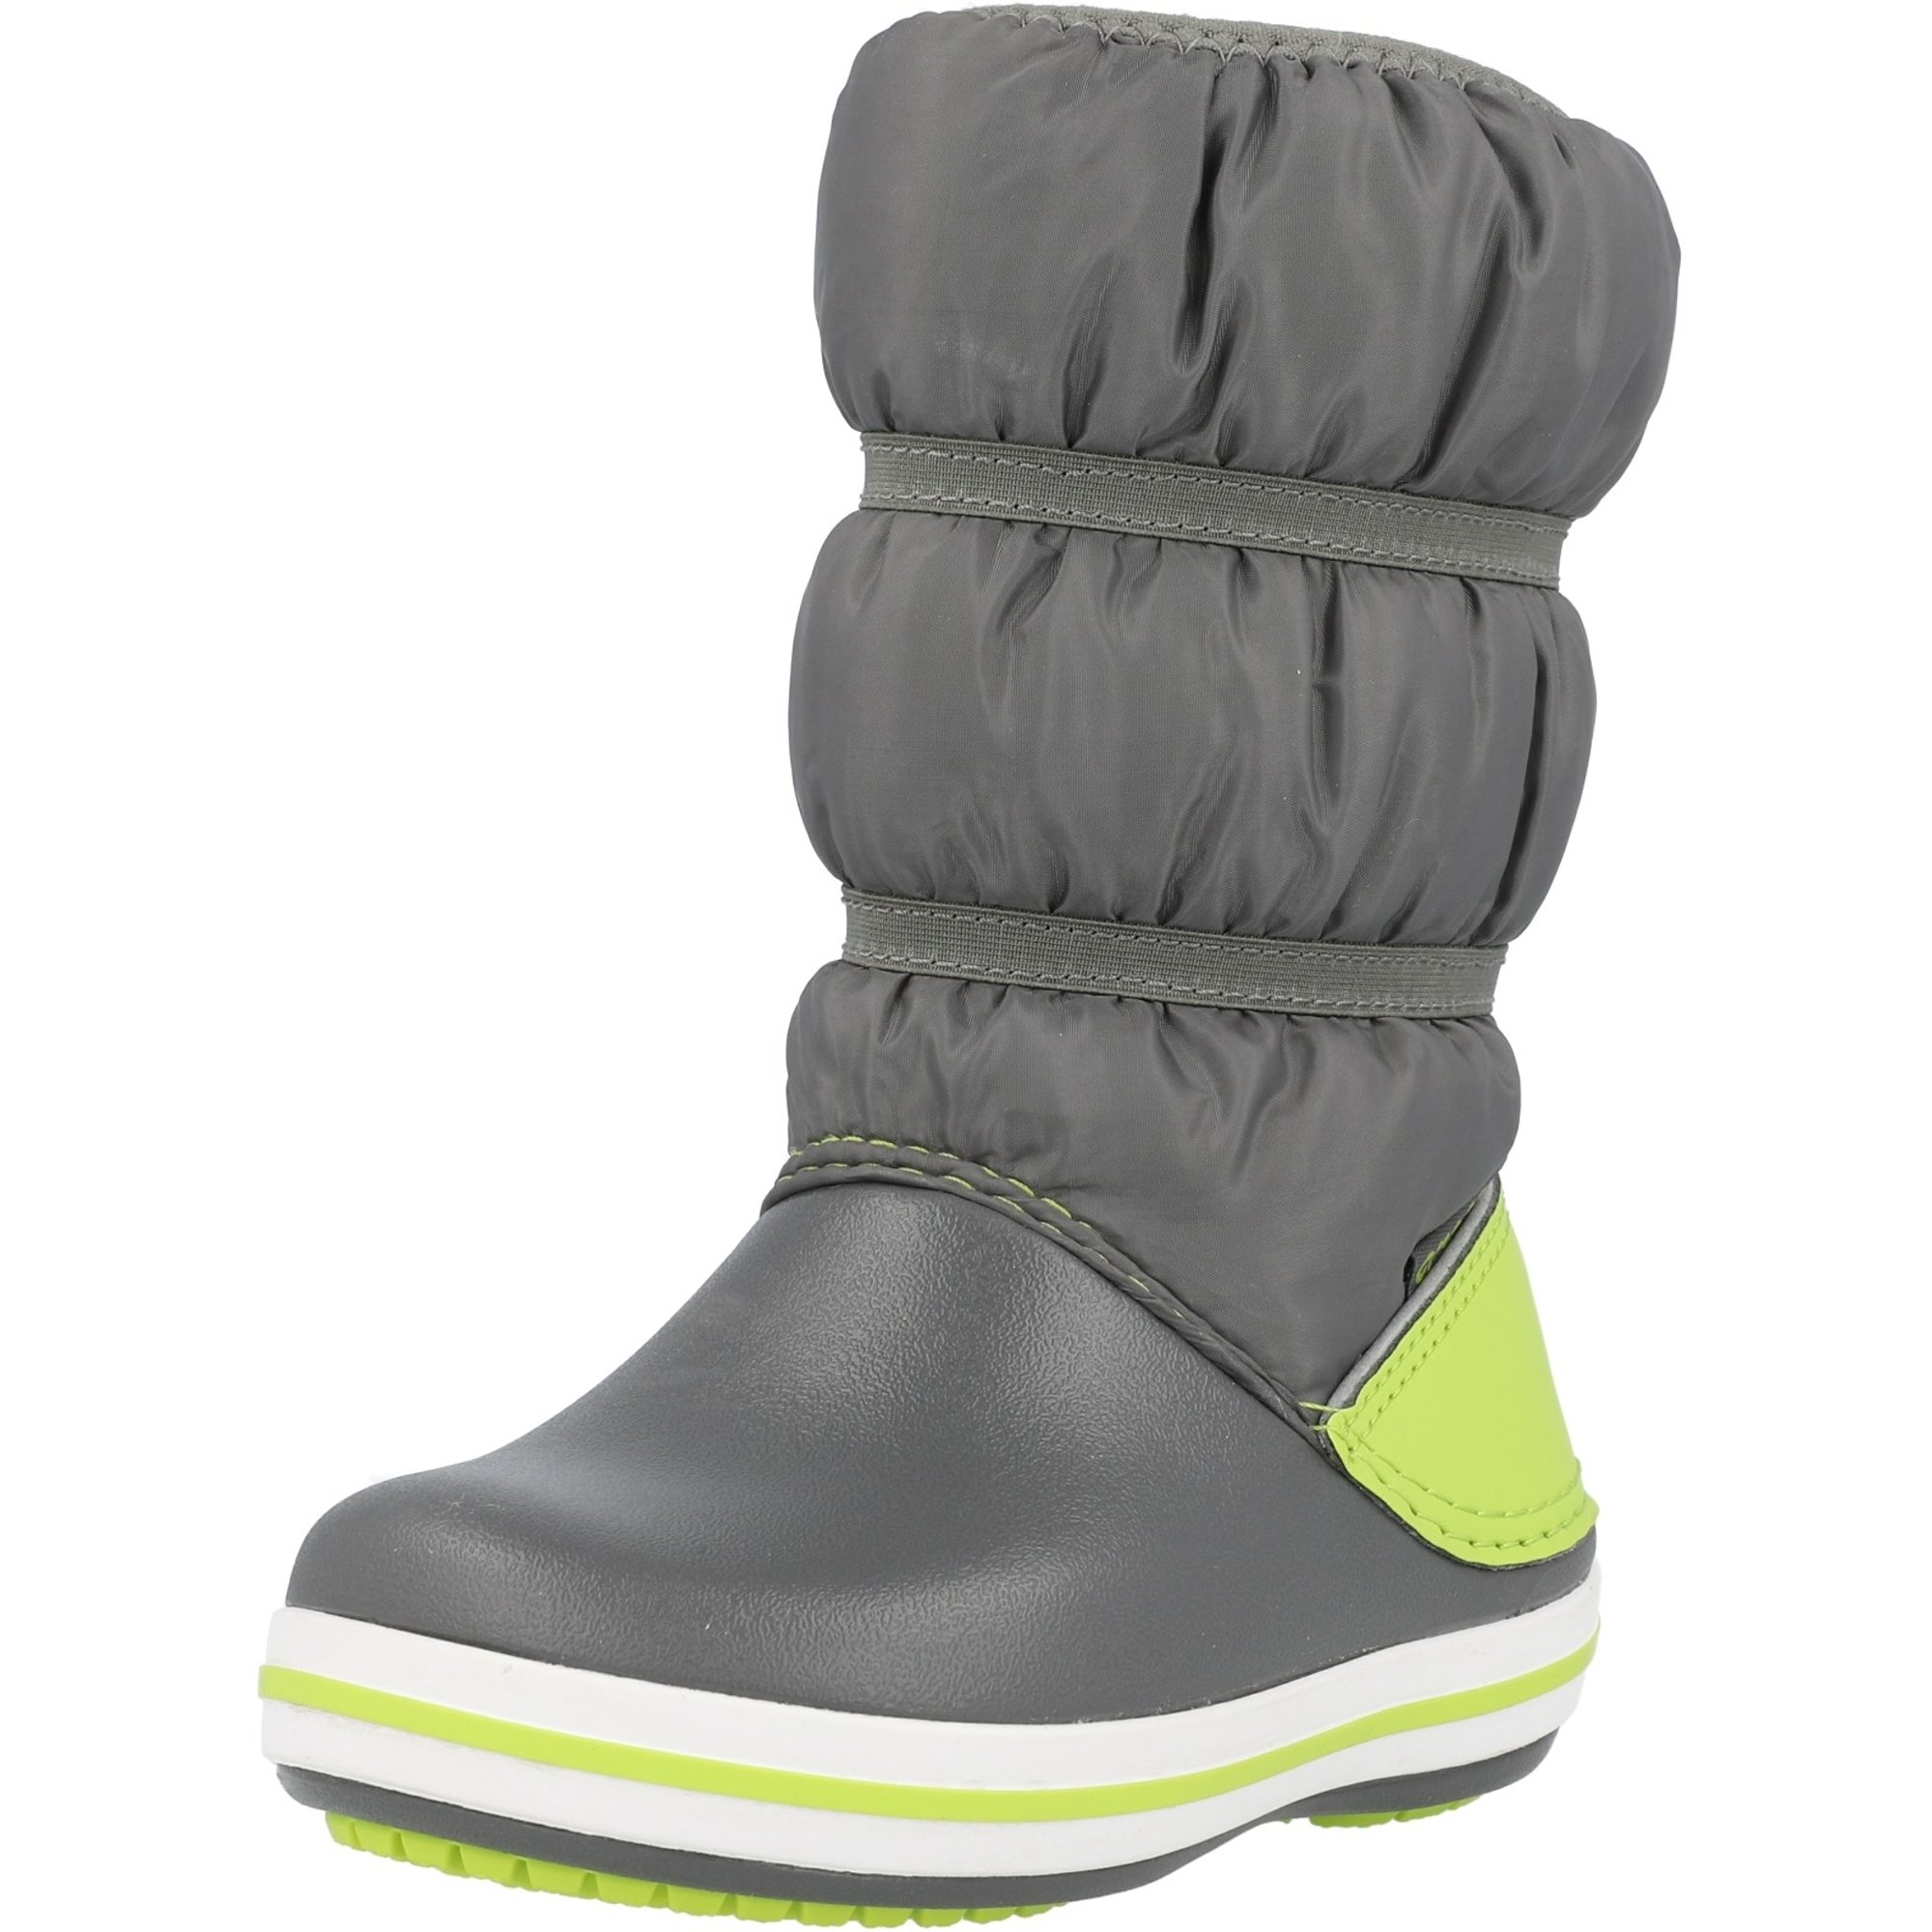 Crocs Kids Crocband Winter Boot Slate Grey/Lime Punch Croslite